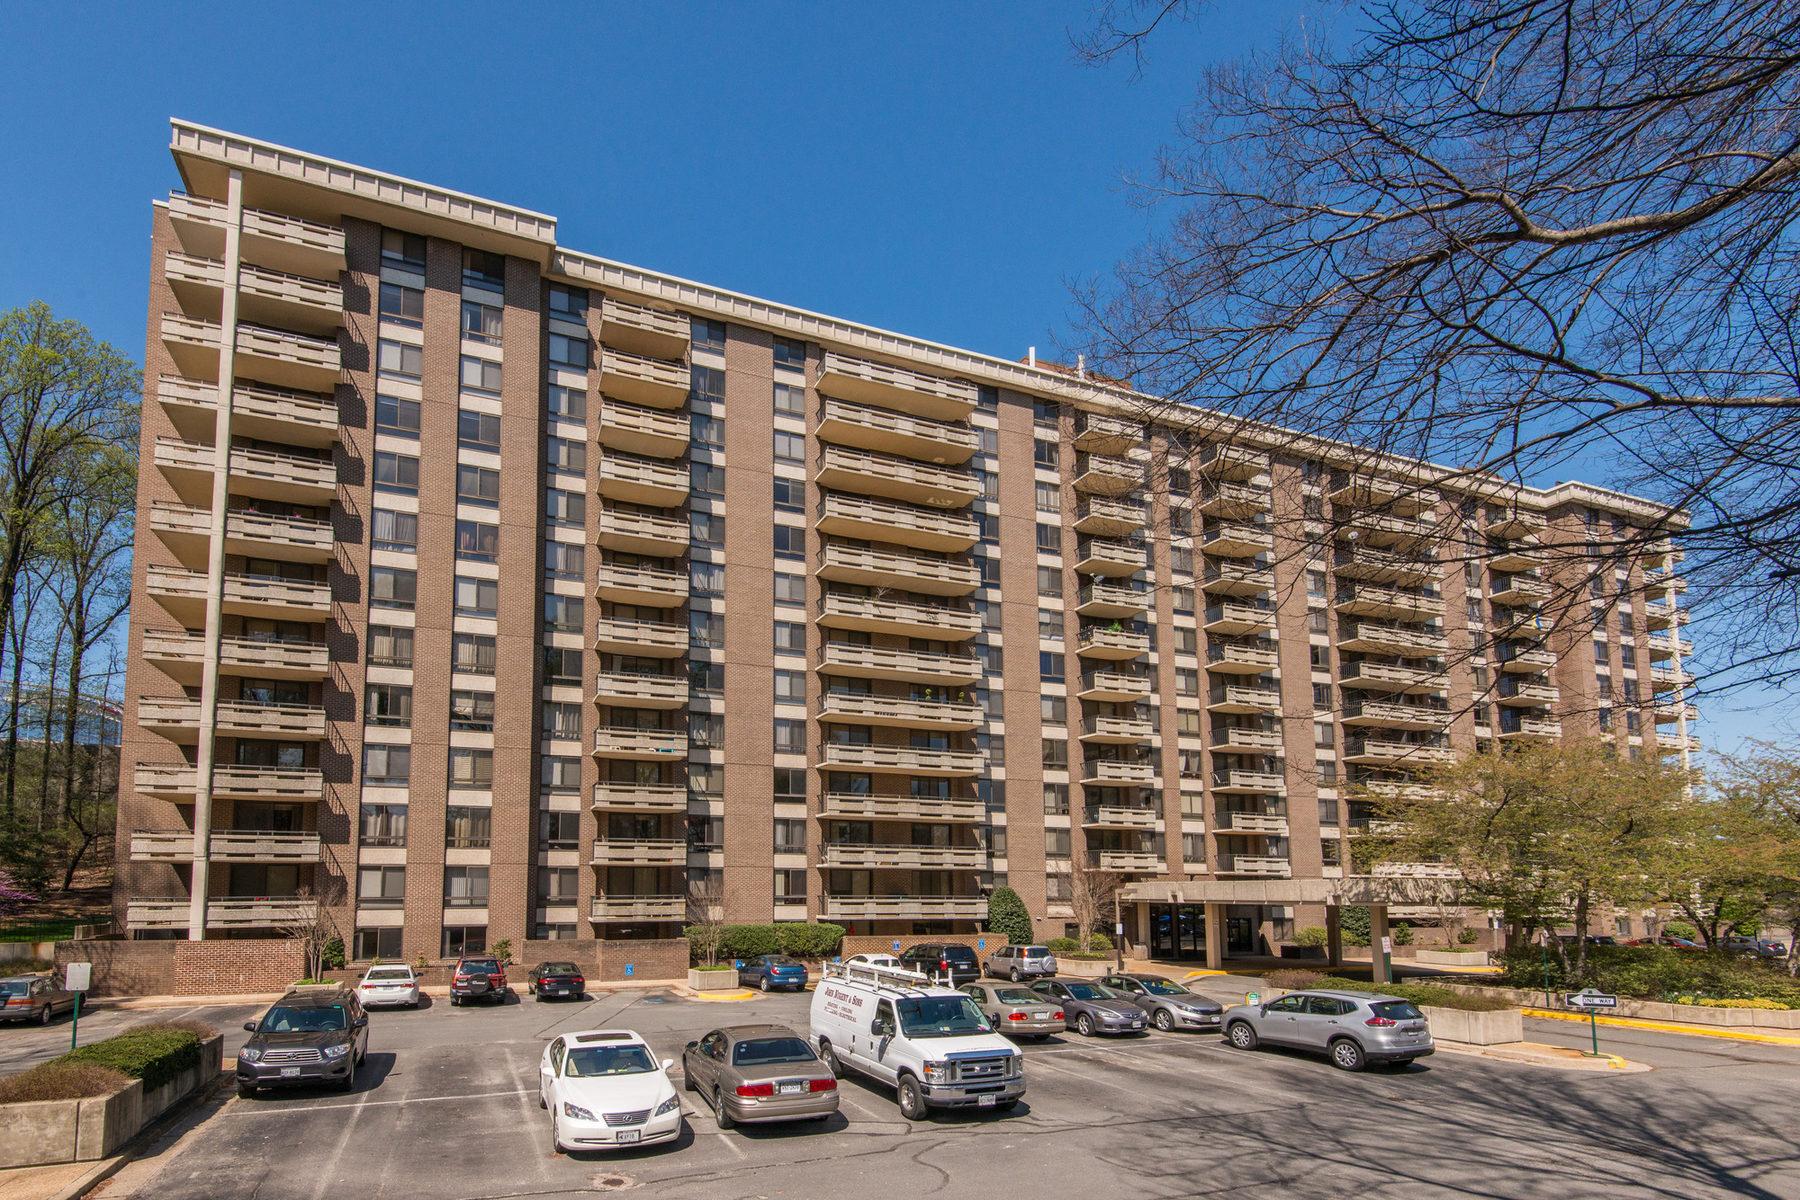 Eigentumswohnung für Verkauf beim 1808 Old Meadow Road 1407, McLean 1808 Old Meadow Rd 1407 McLean, Virginia, 22102 Vereinigte Staaten